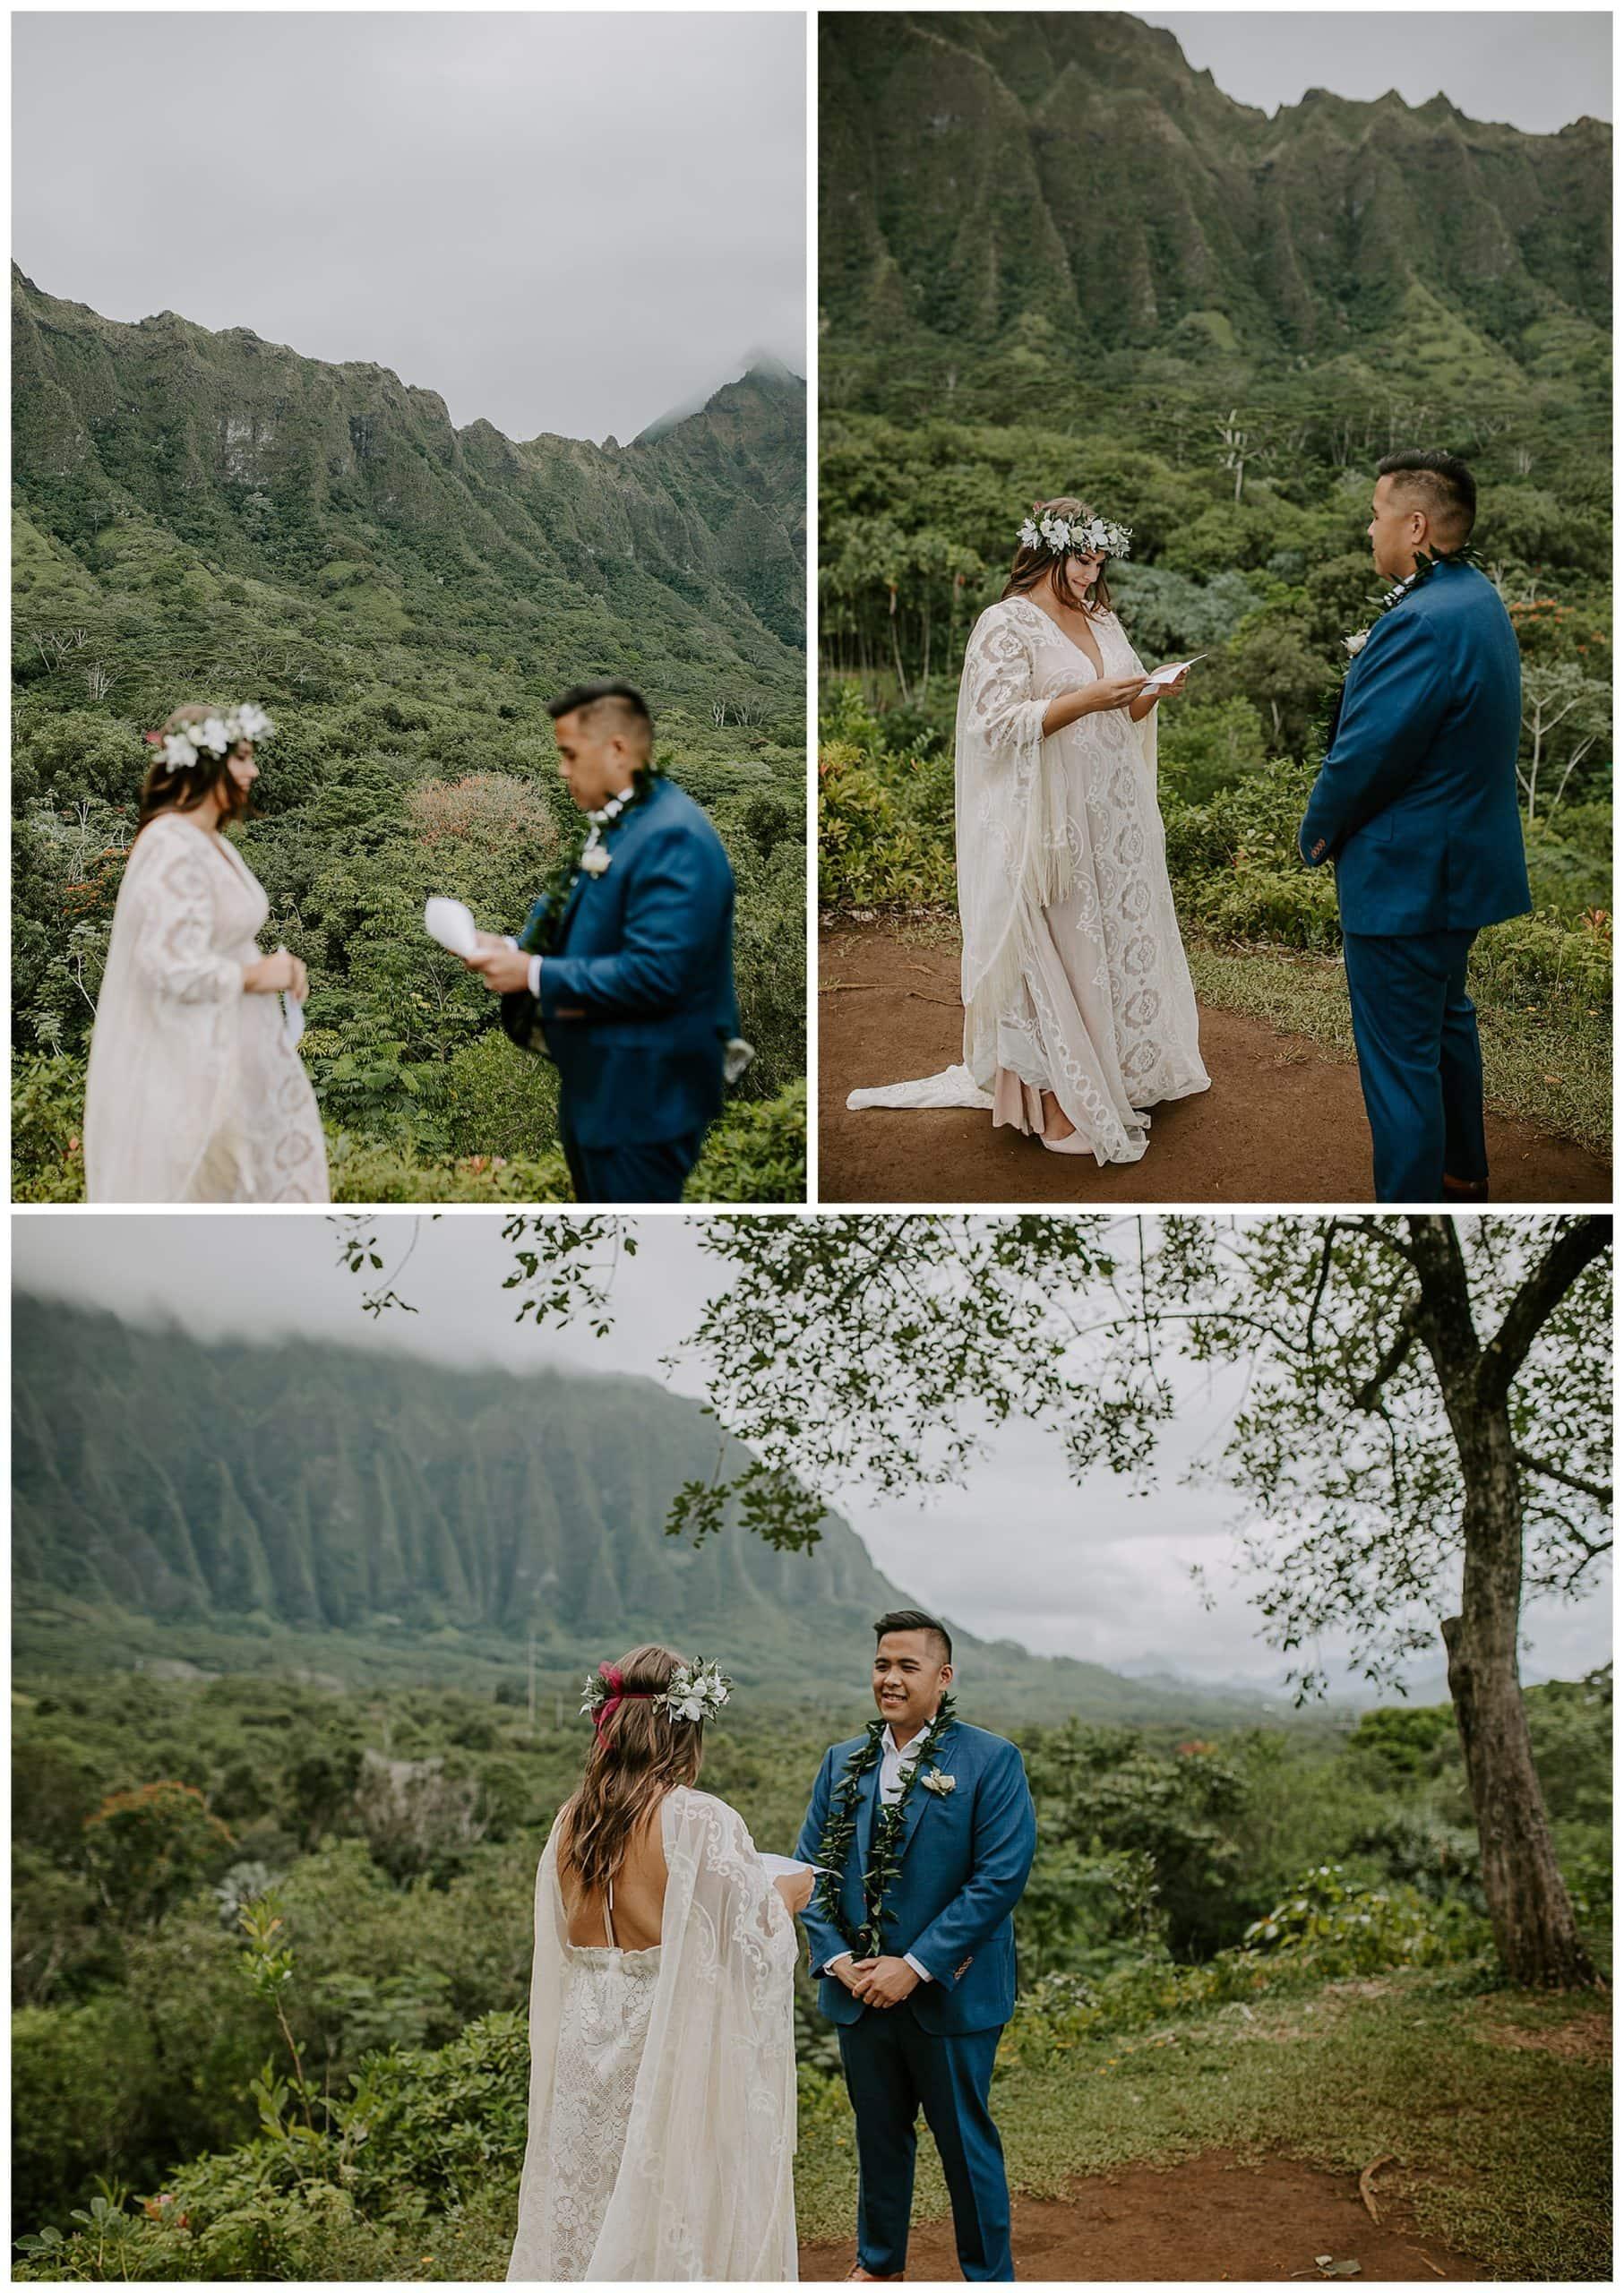 wedding ceremony at Ho'omaluhia Botanical Garden